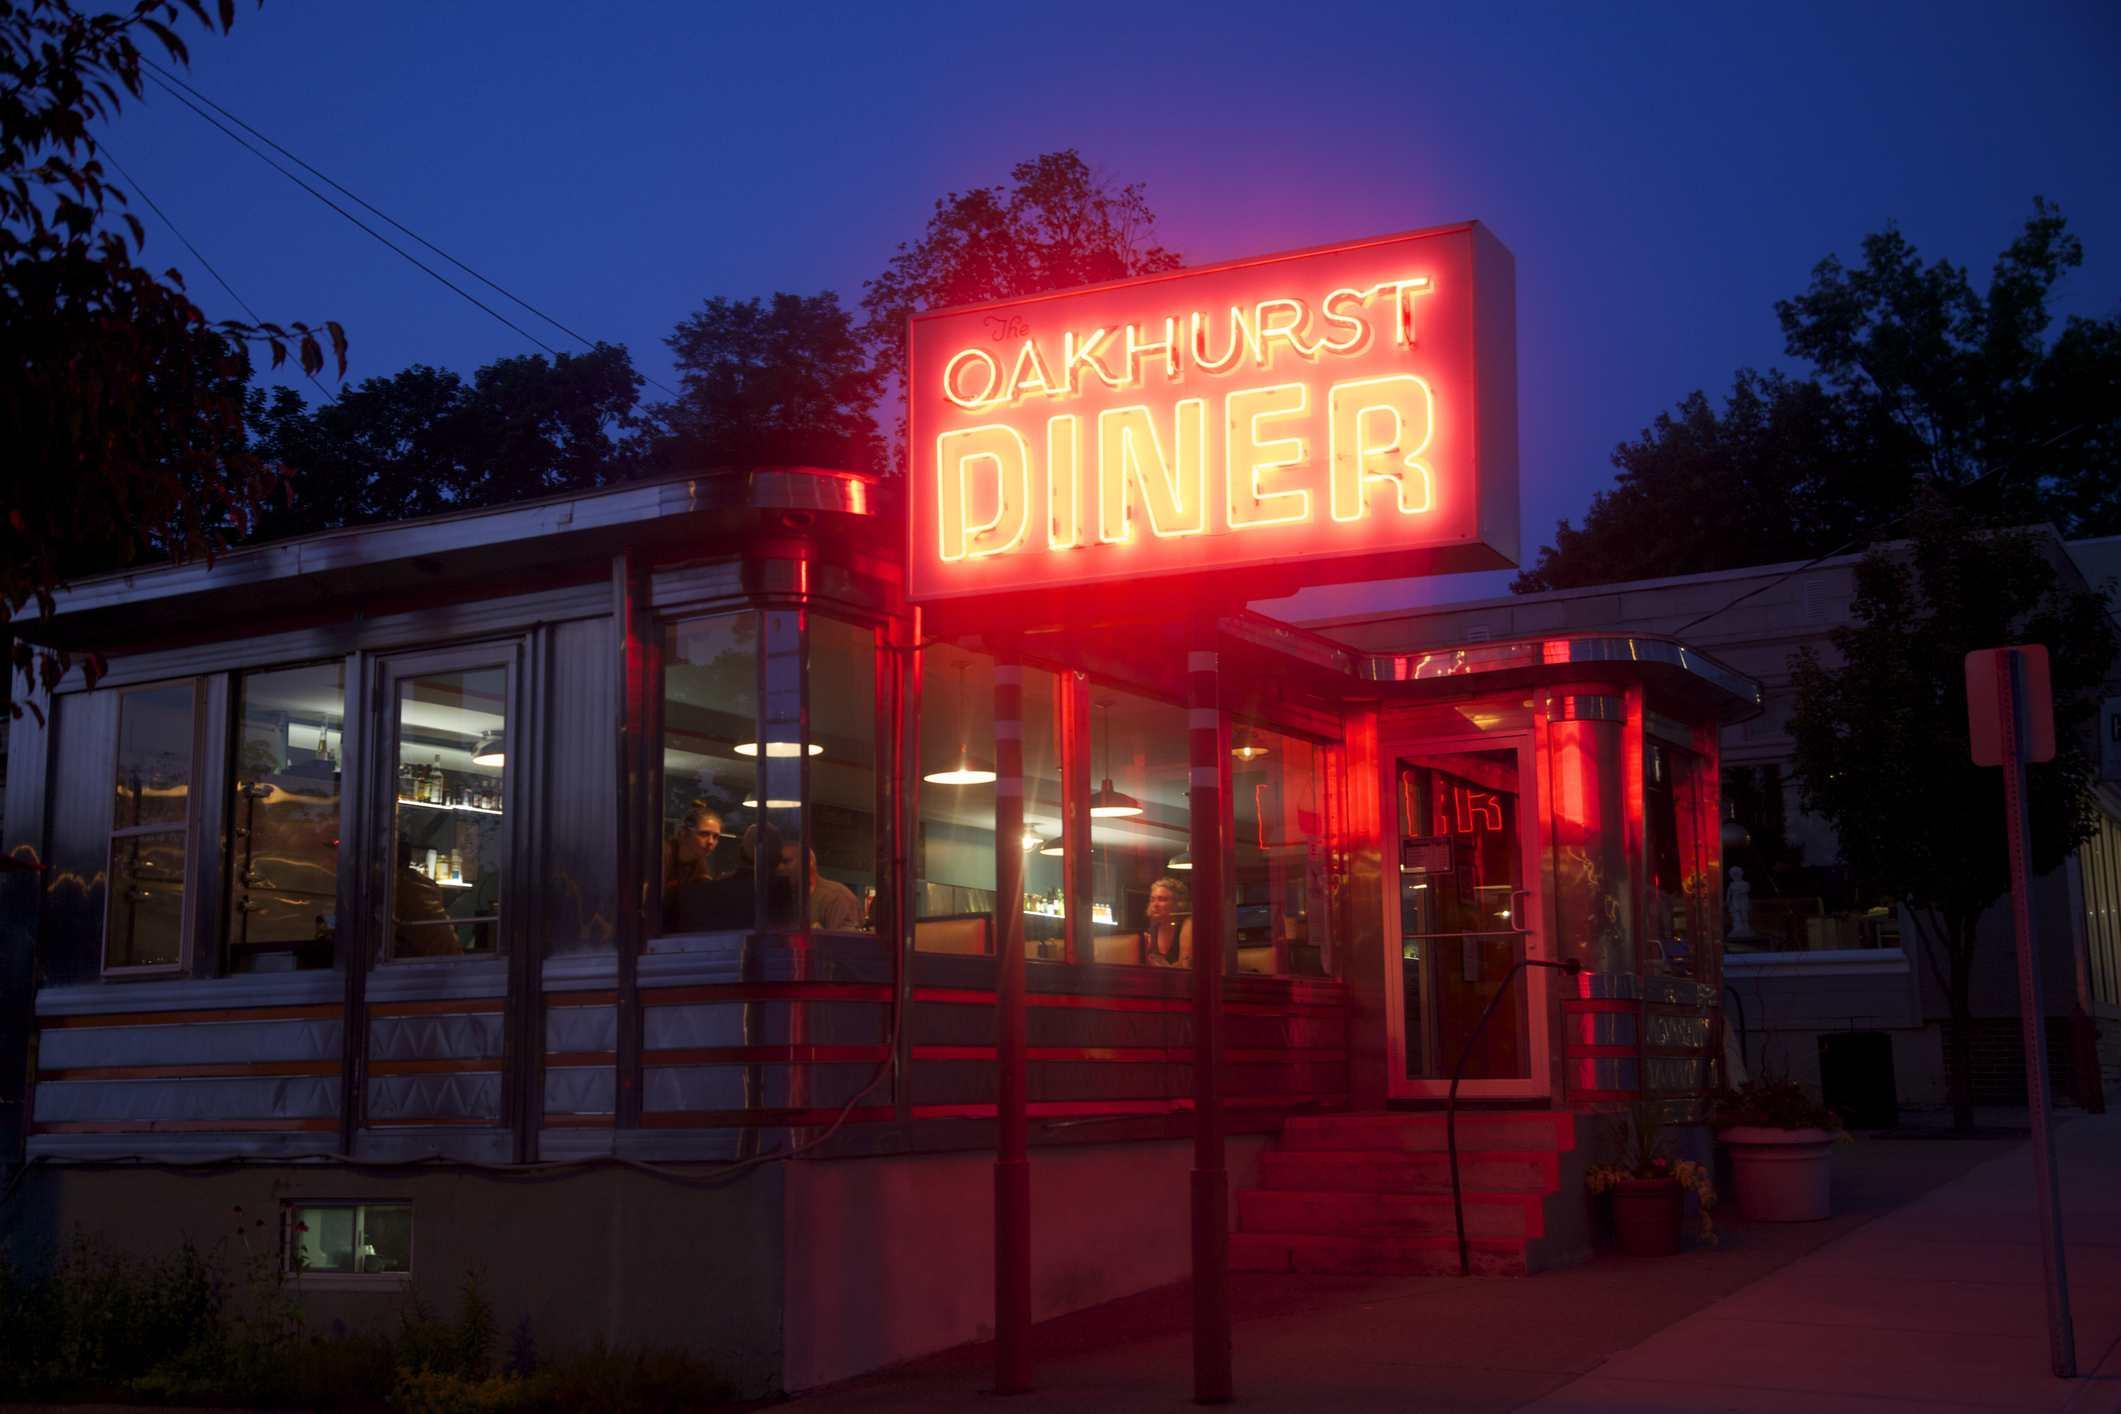 Glowing neon of diner sign in Millerton, New York